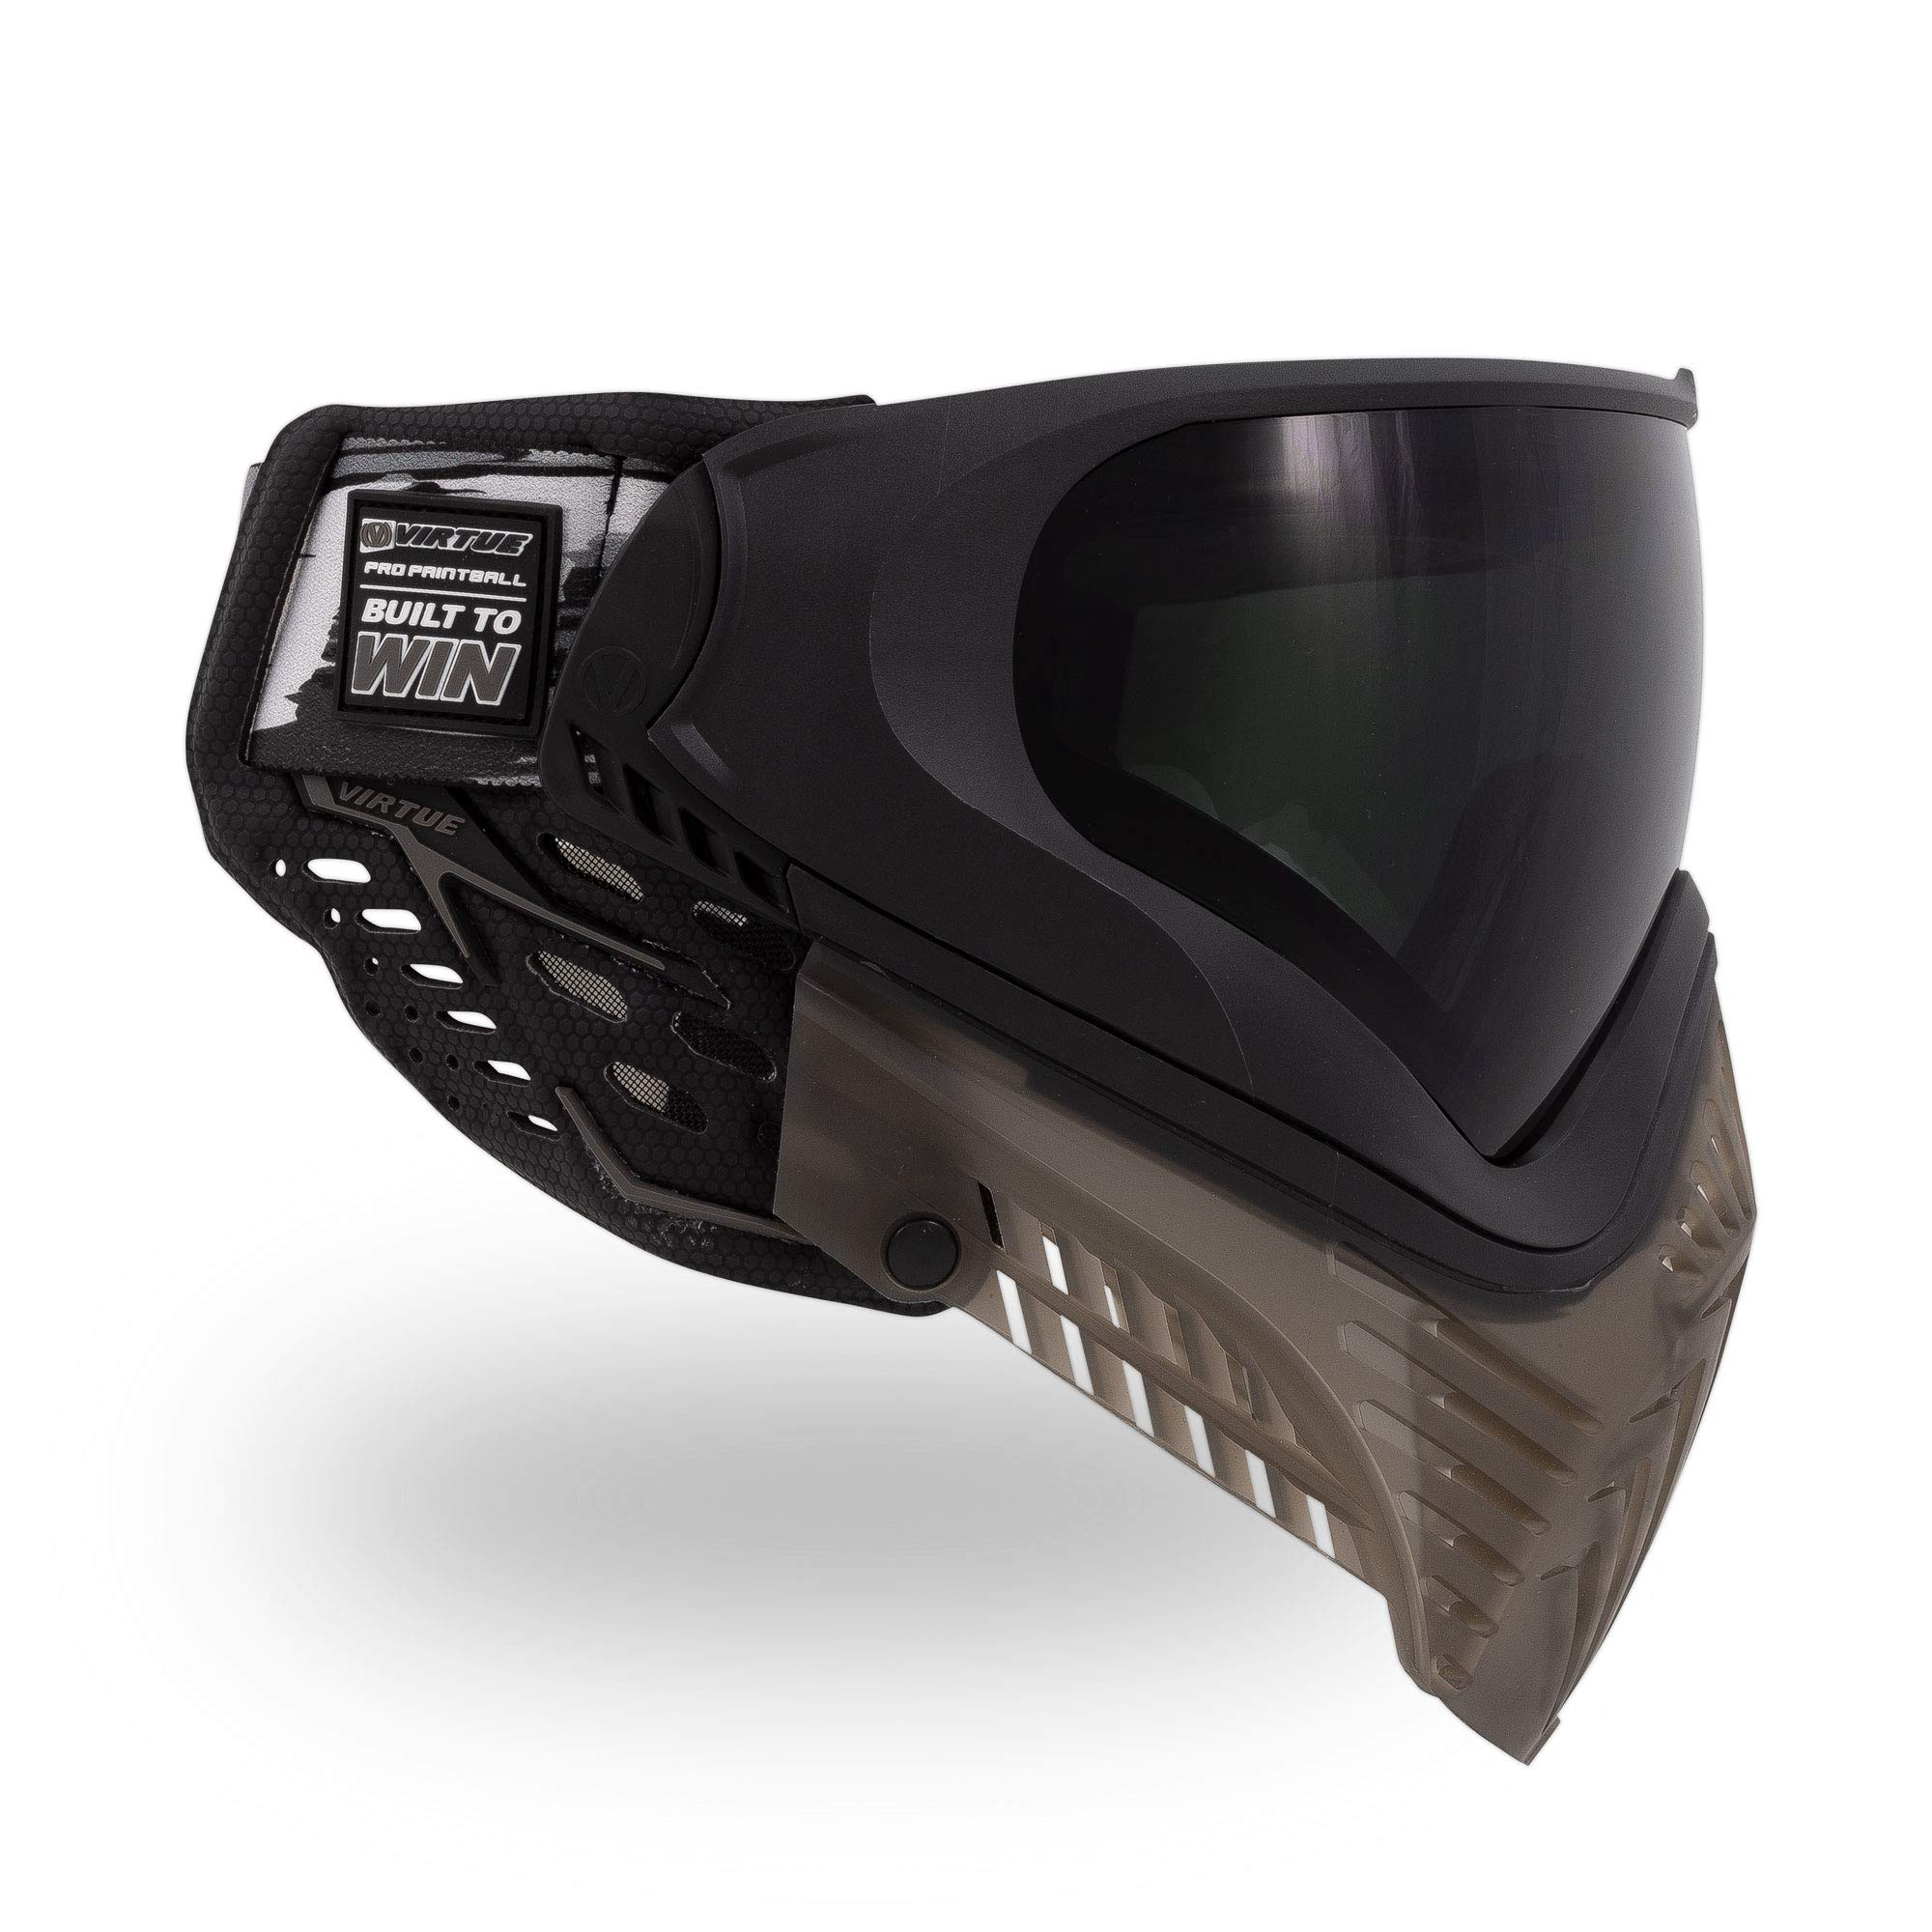 Virtue VIO XS II Thermal Paintball Goggles/Masks - Black Smoke by Virtue Paintball